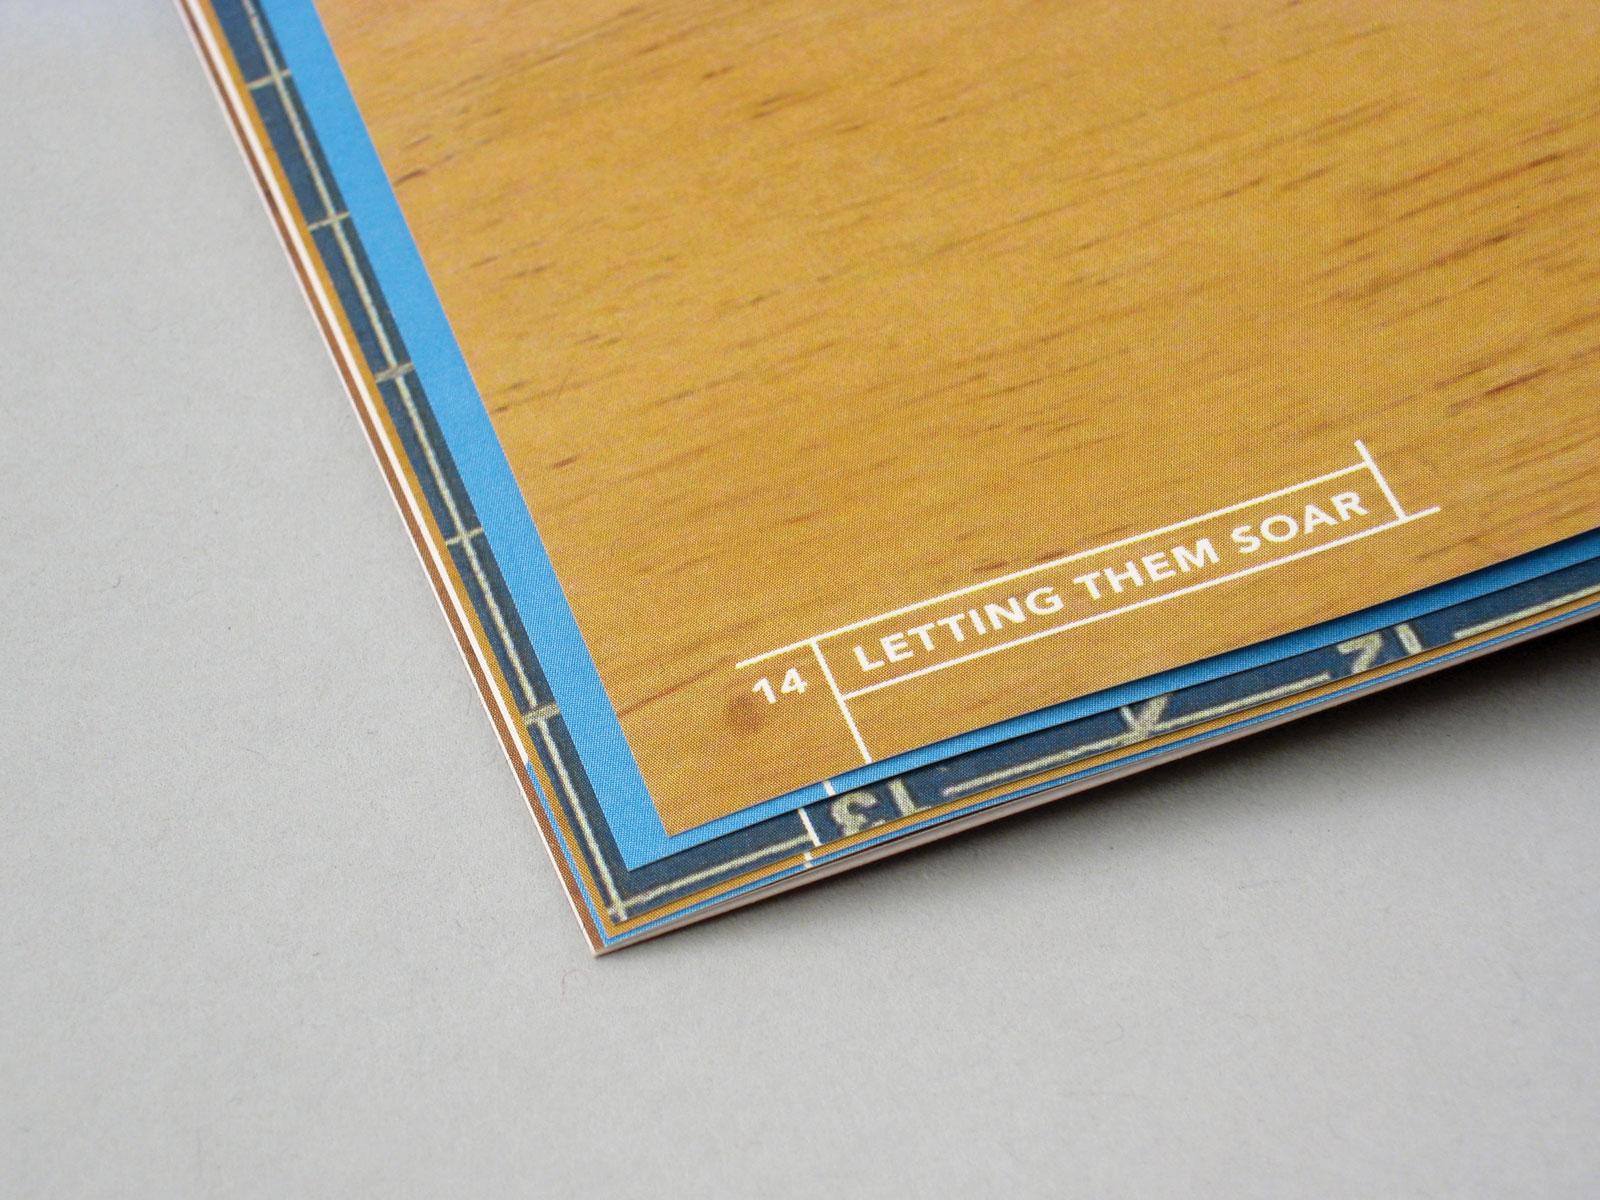 folio-closeup_1600x1200.jpg